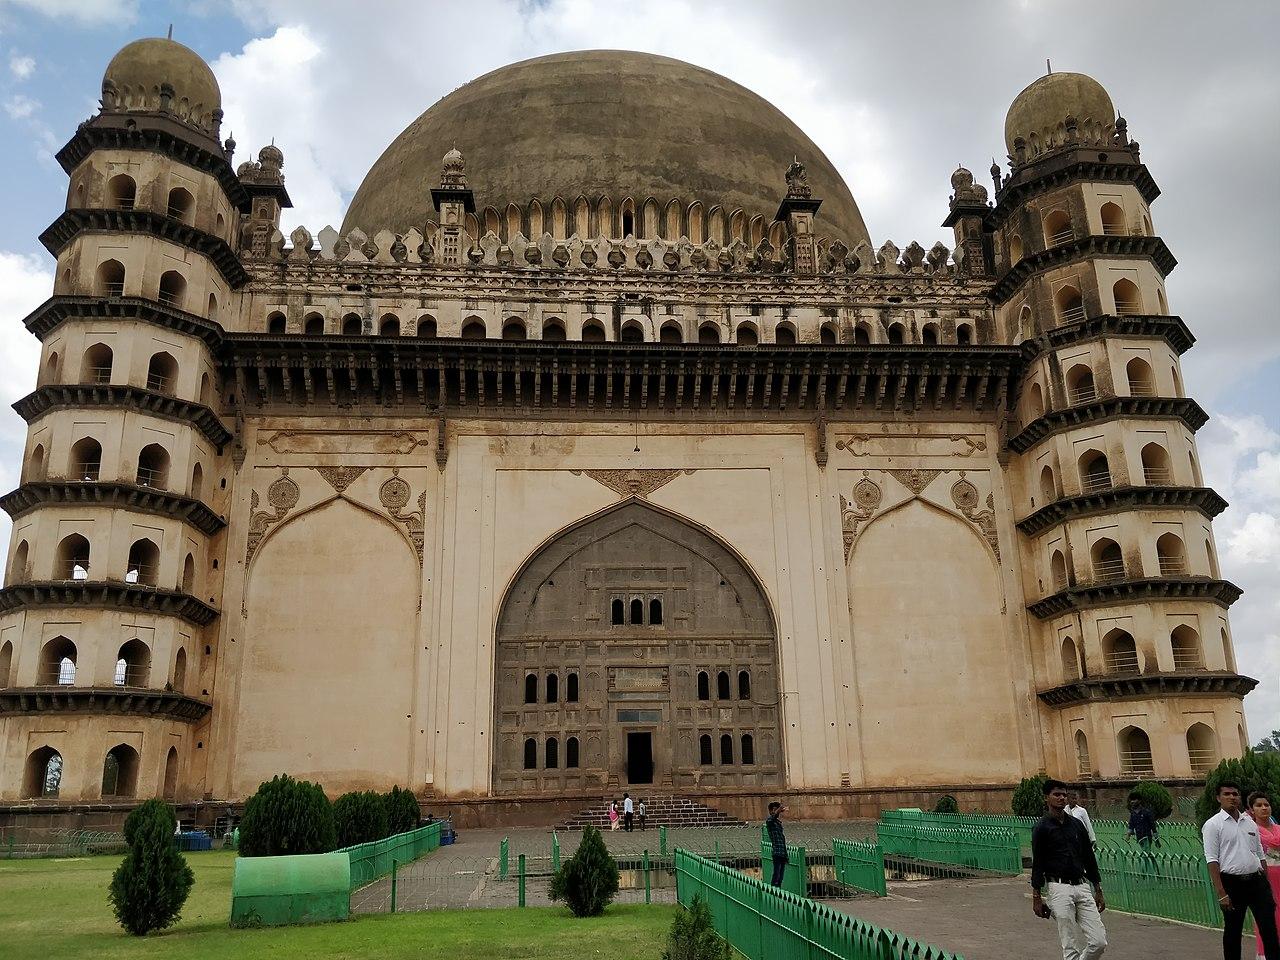 Structure & History of Gol Gumbaz in Vijayapura (Bijapur)